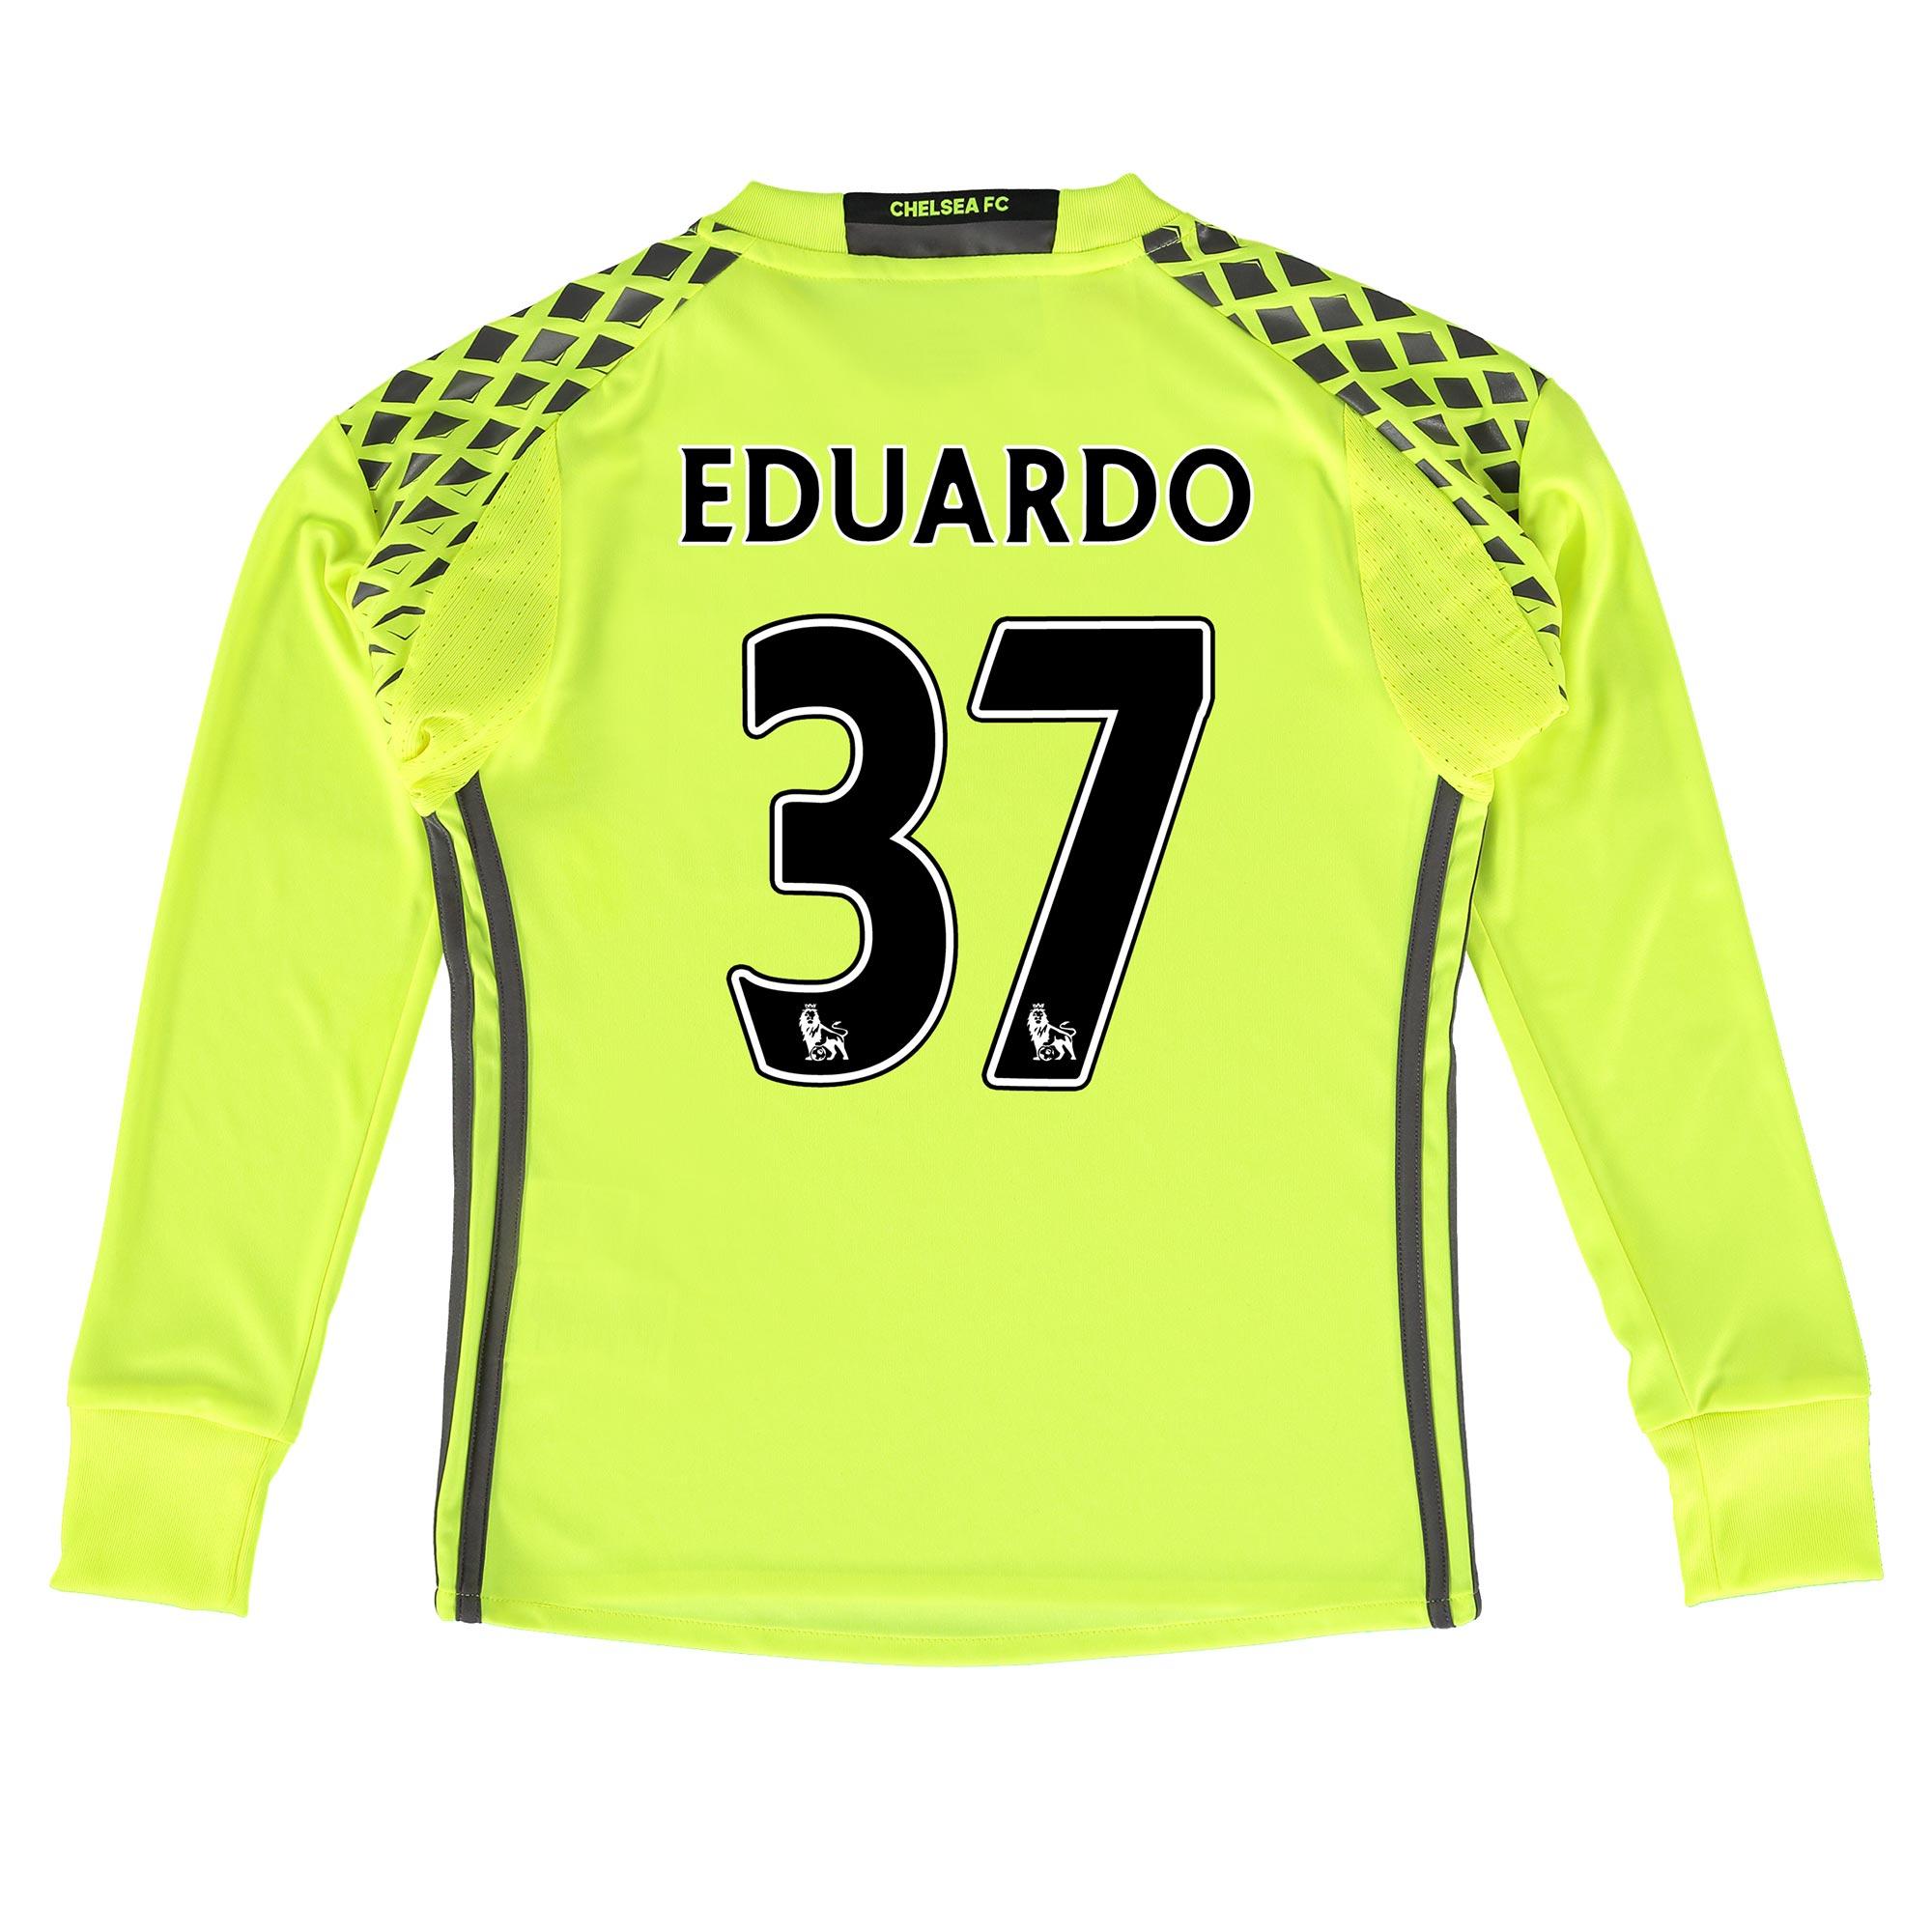 Chelsea Goalkeeper Shirt 16-17 - Kids with Eduardo 37 printing